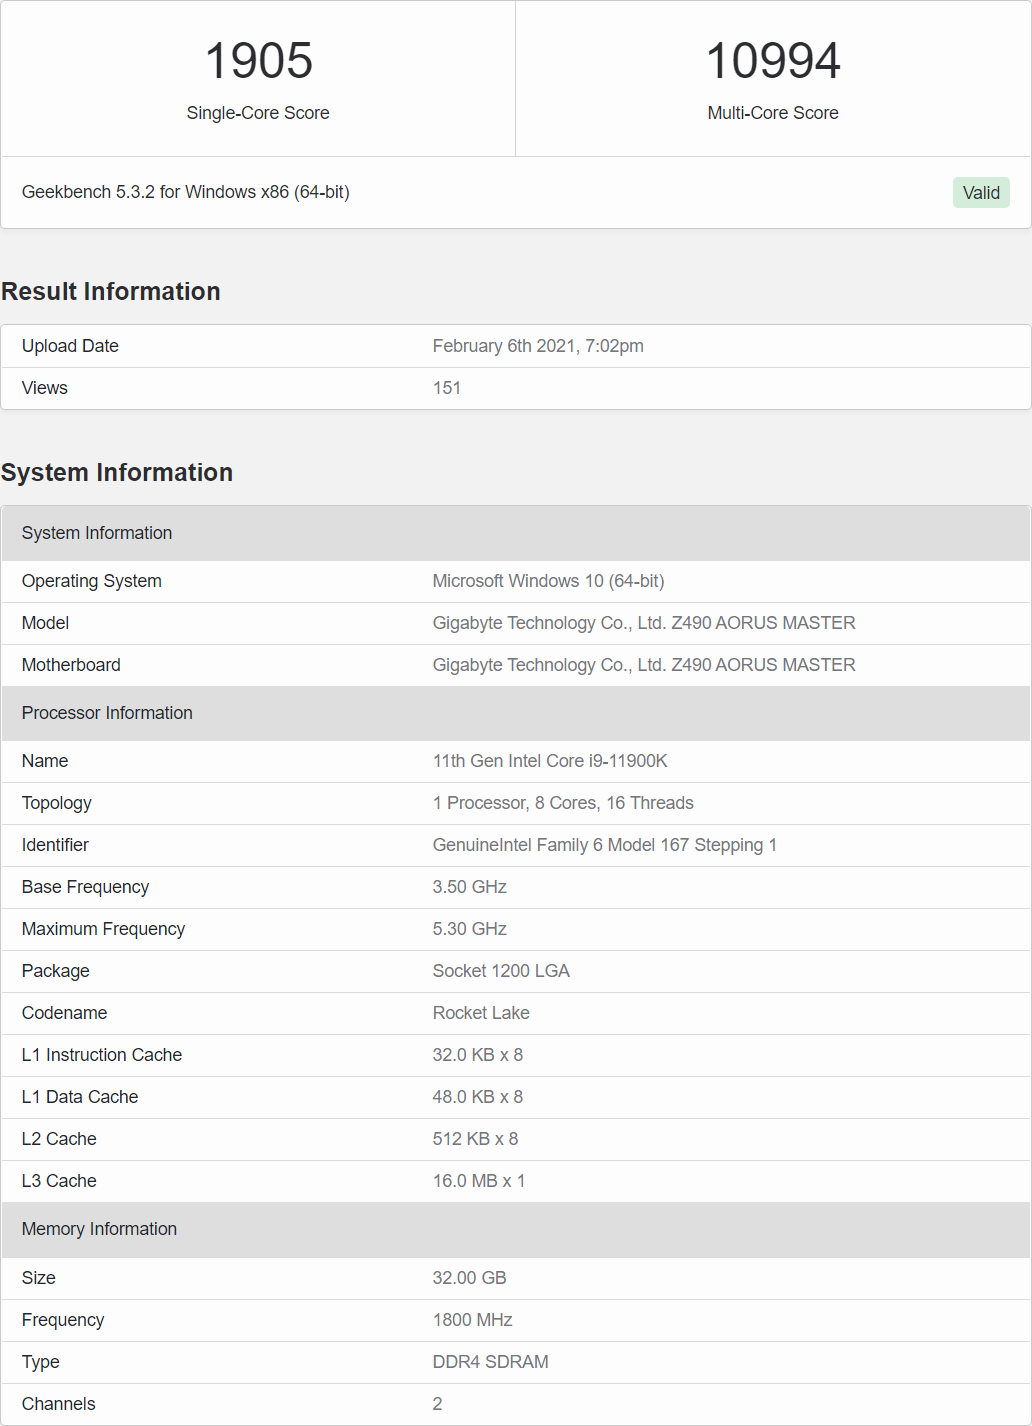 intel-core-i9-11900k-rocket-lake-desktop-cpu-single-threaded-performance-benchmark-_1